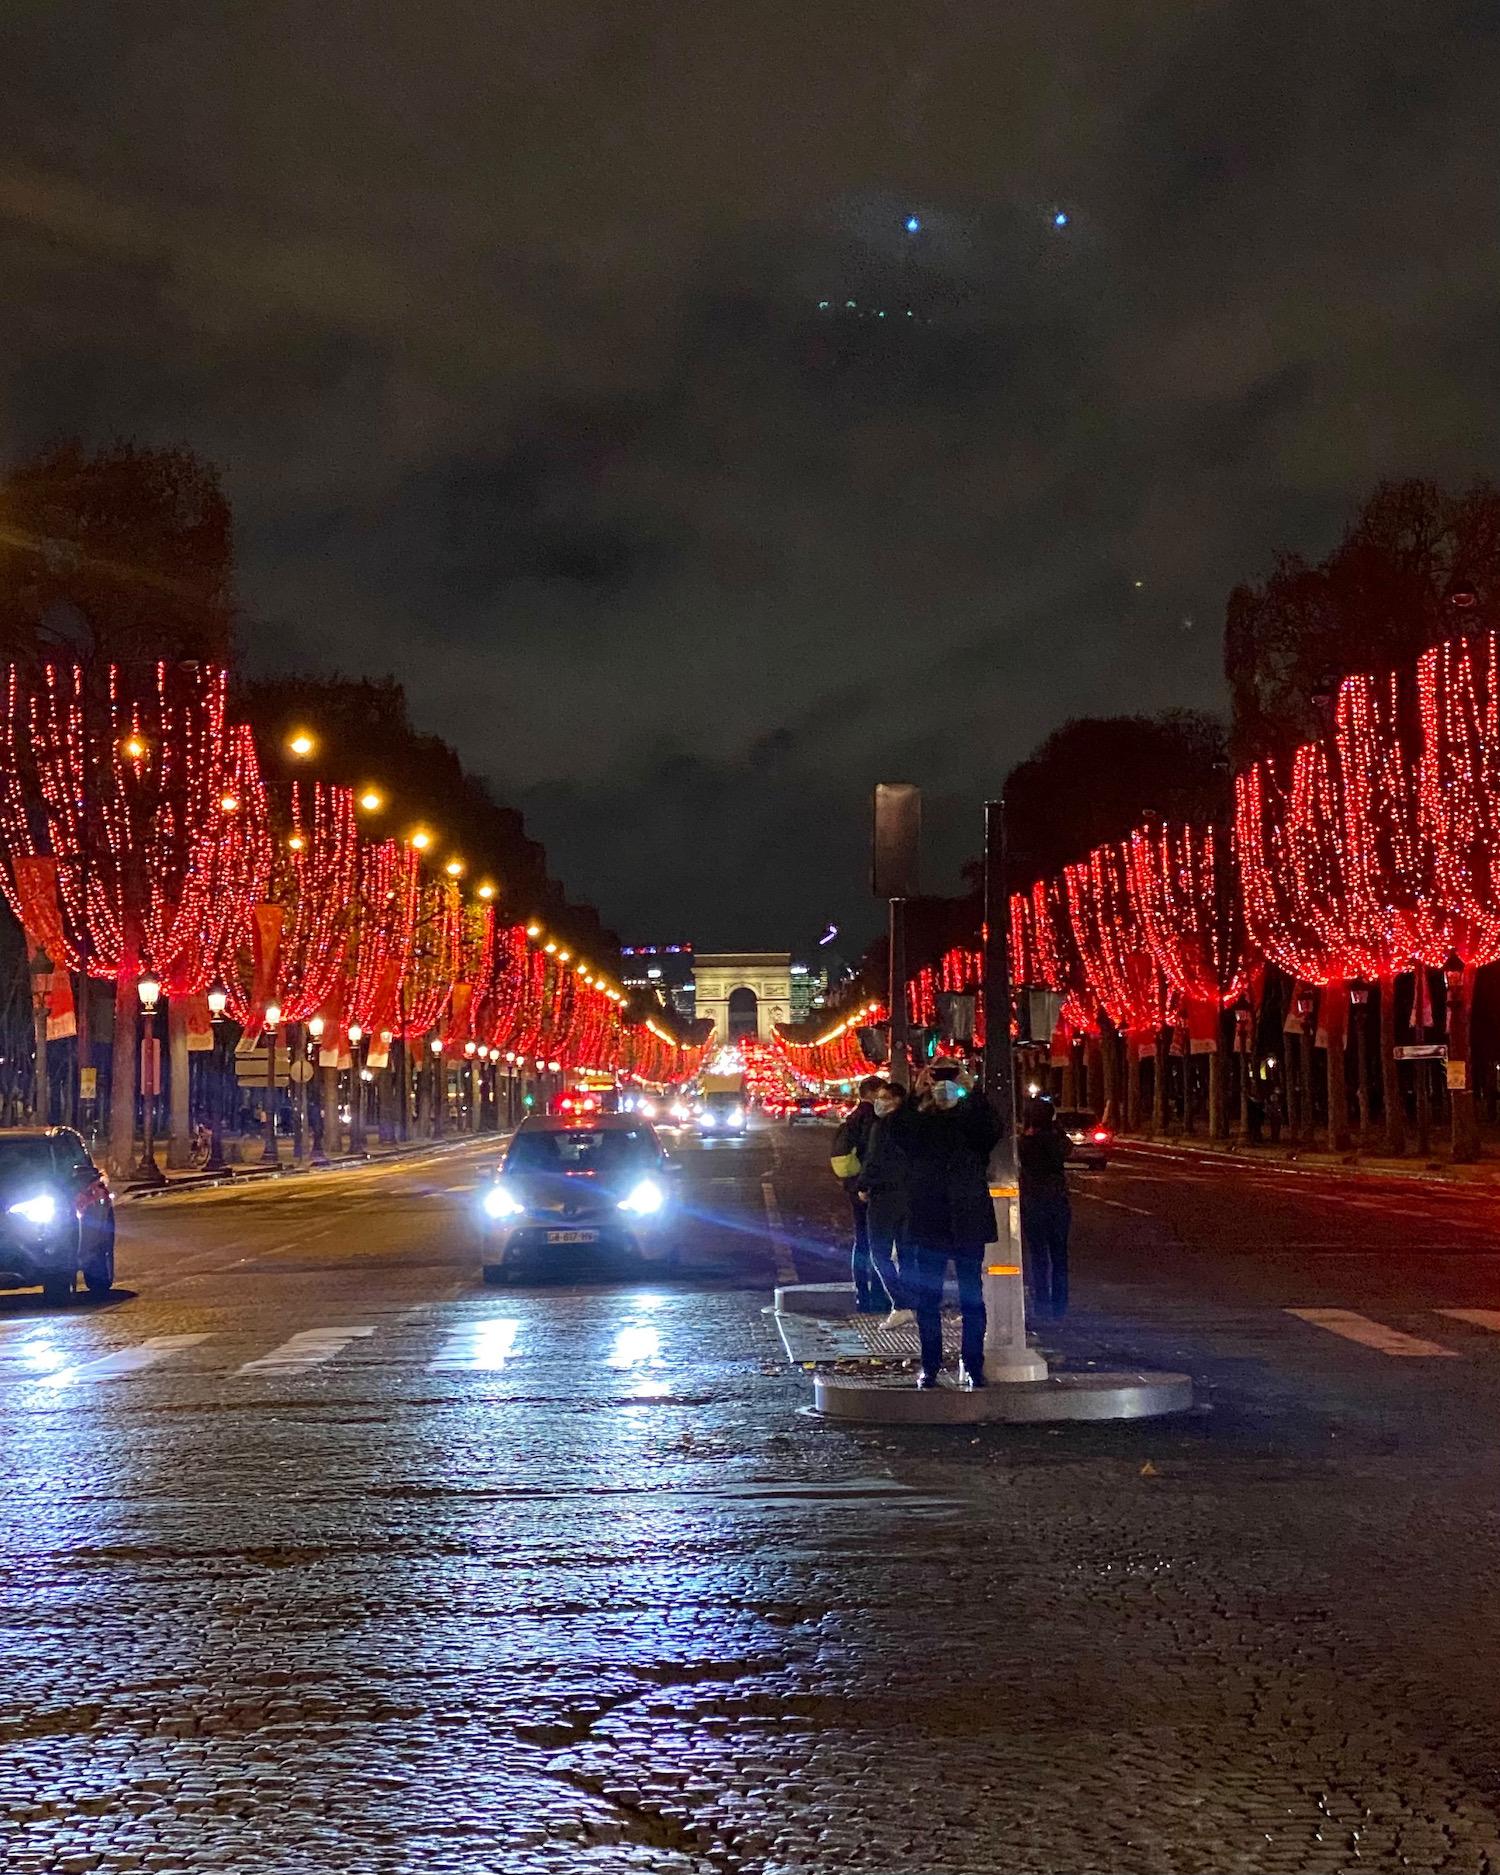 avenue des champs-élysees at christmas